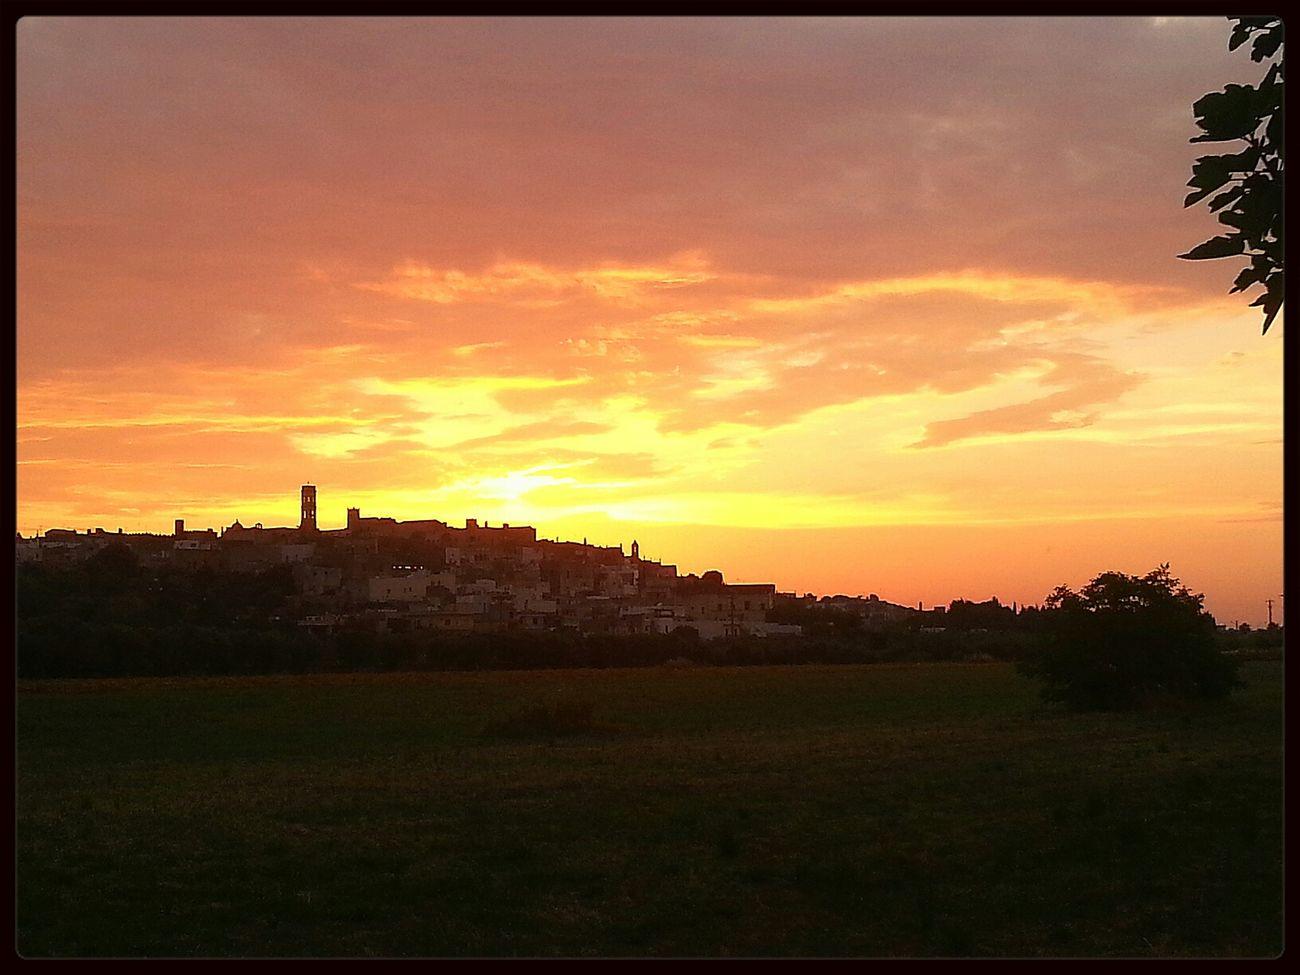 Sunset Enjoying Life The Explorer - 2014 EyeEm Awards Specchia